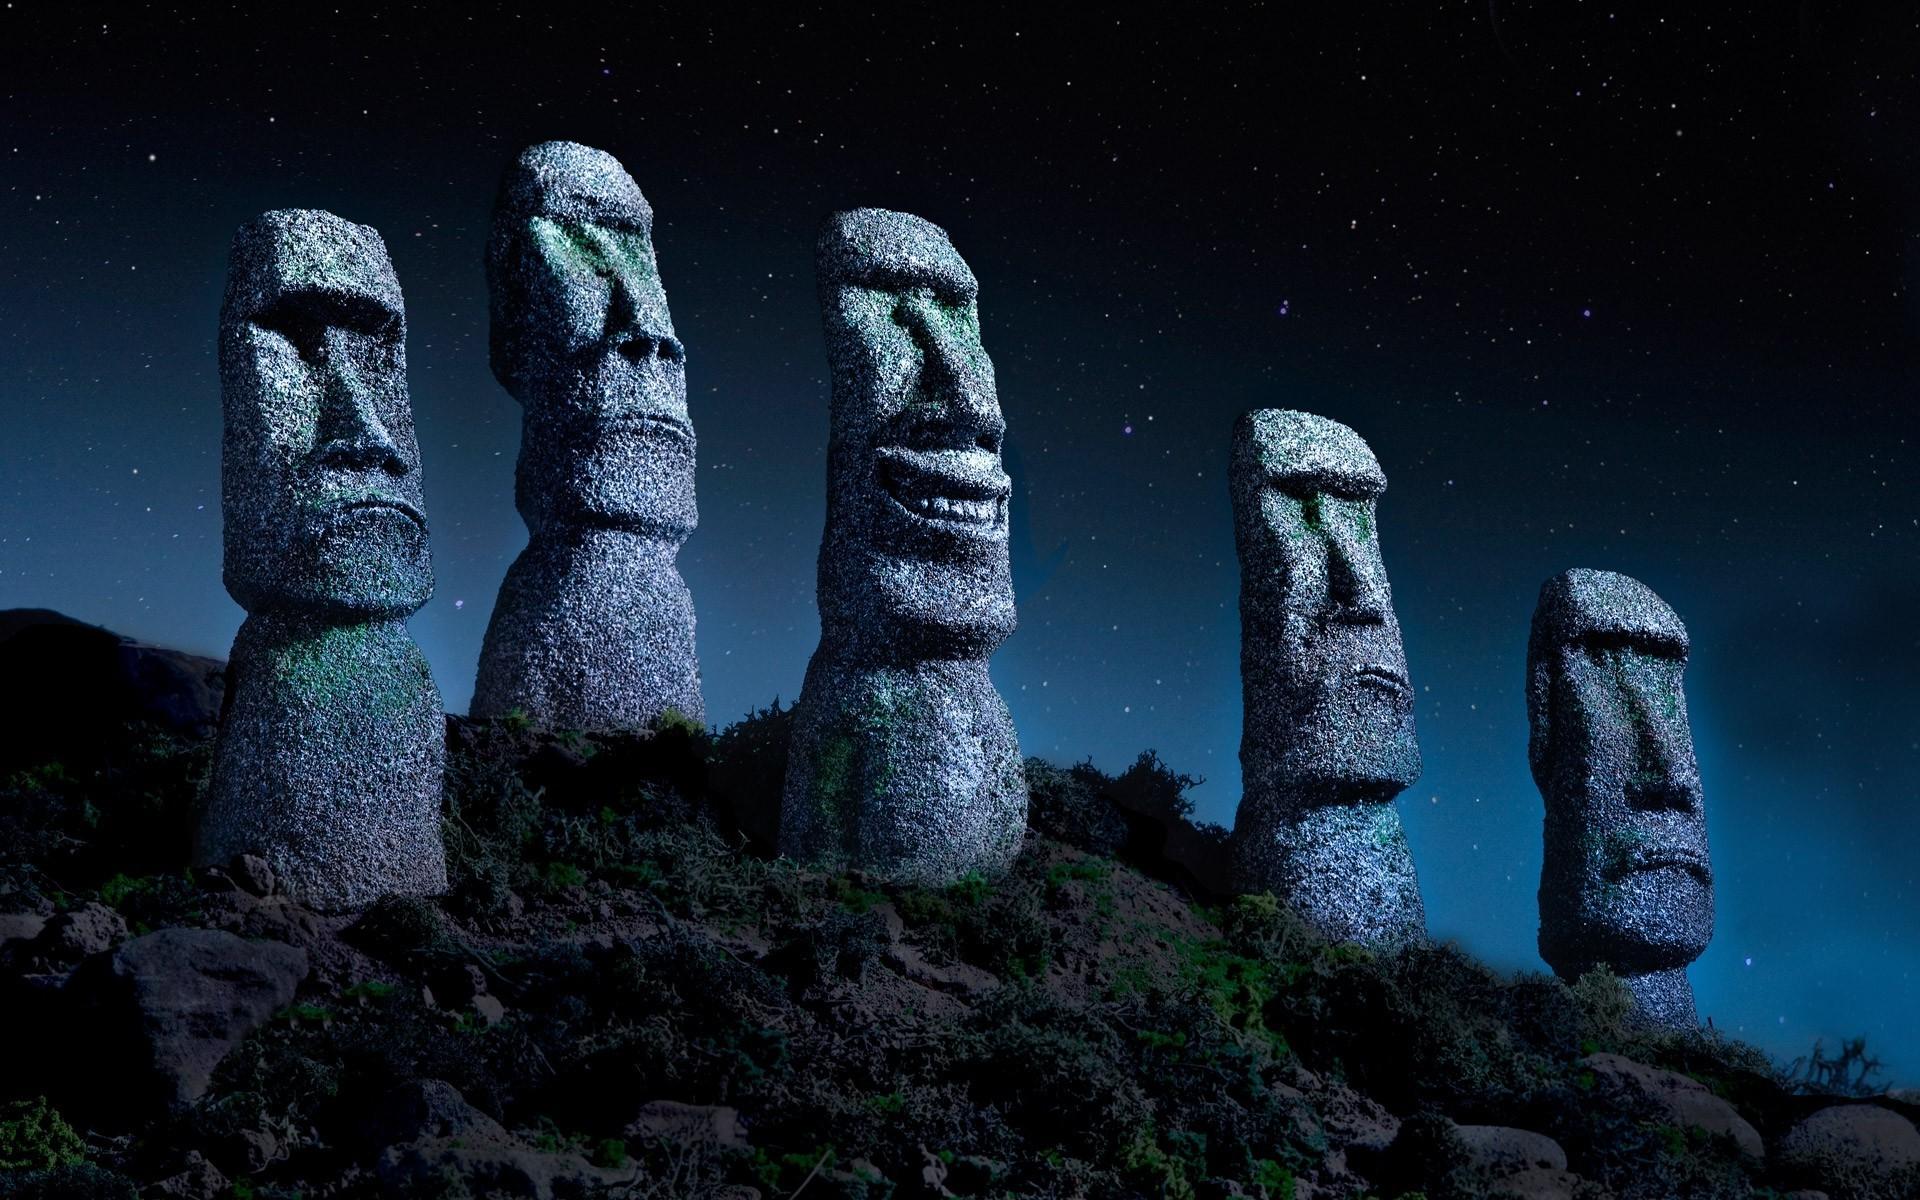 starry night desktop background 67 images